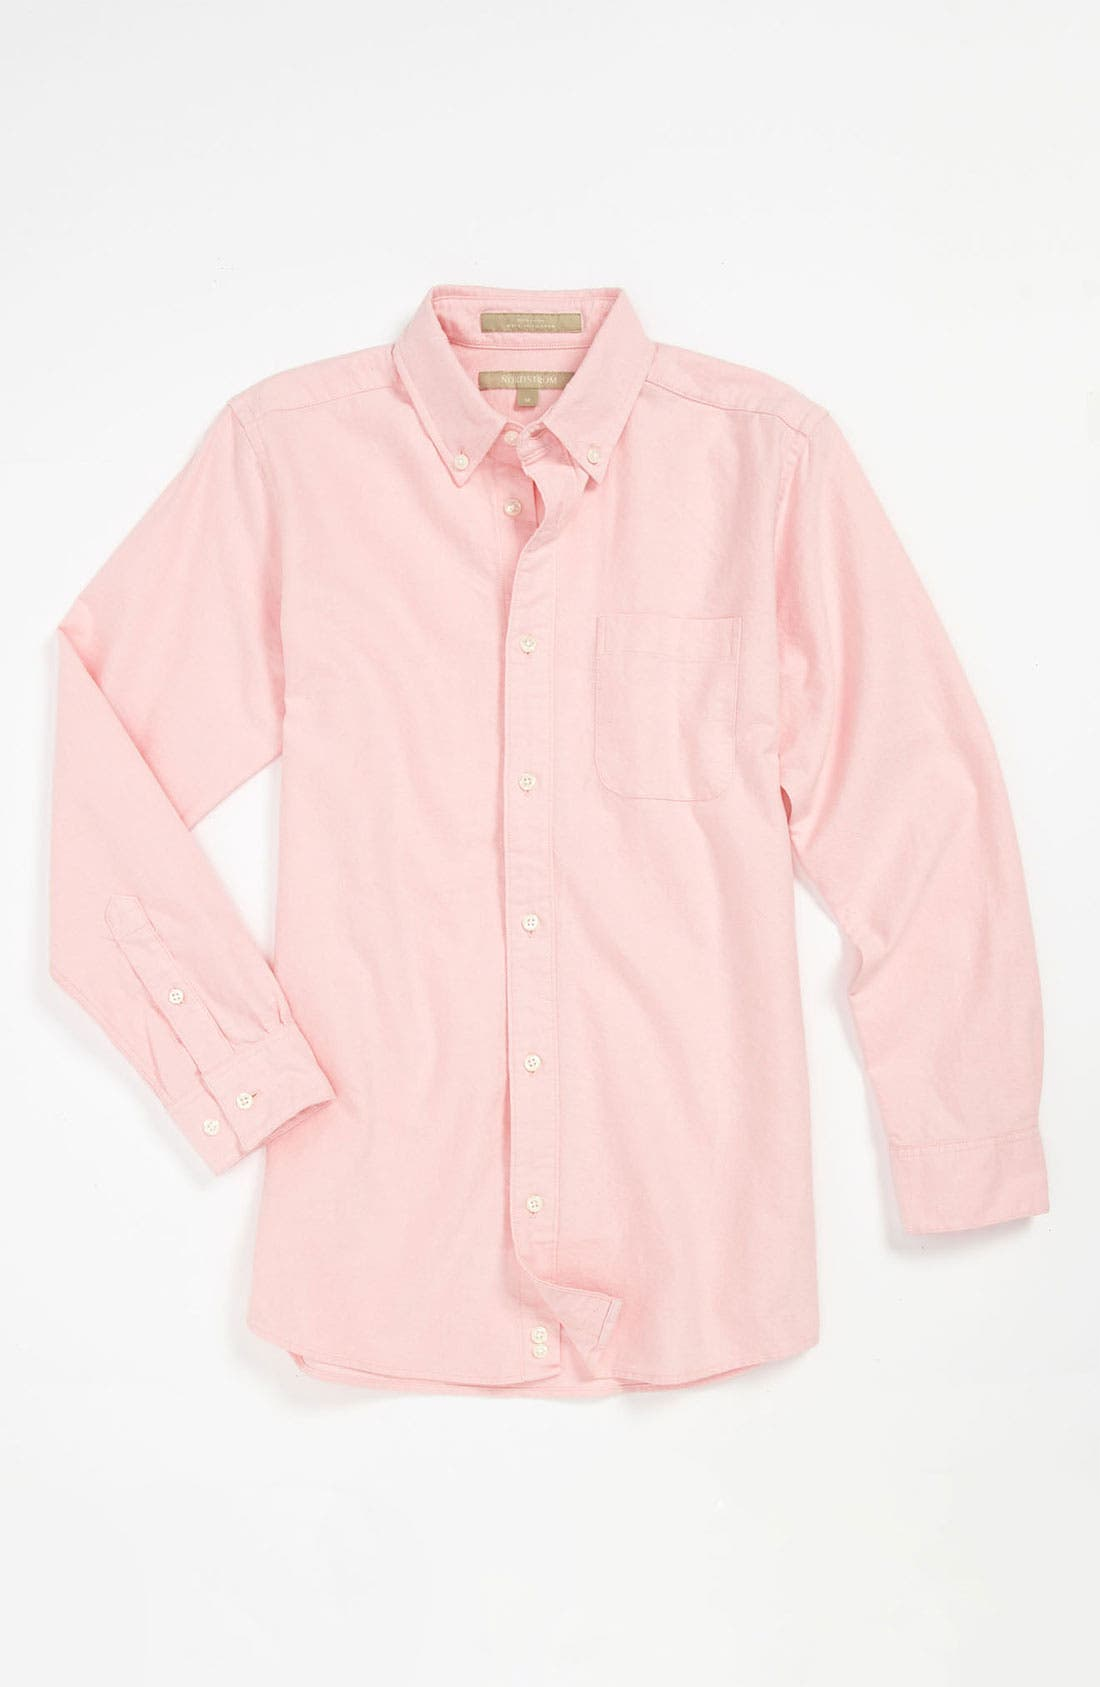 Alternate Image 1 Selected - Nordstrom 'Michael' Woven Oxford Shirt (Little Boys)